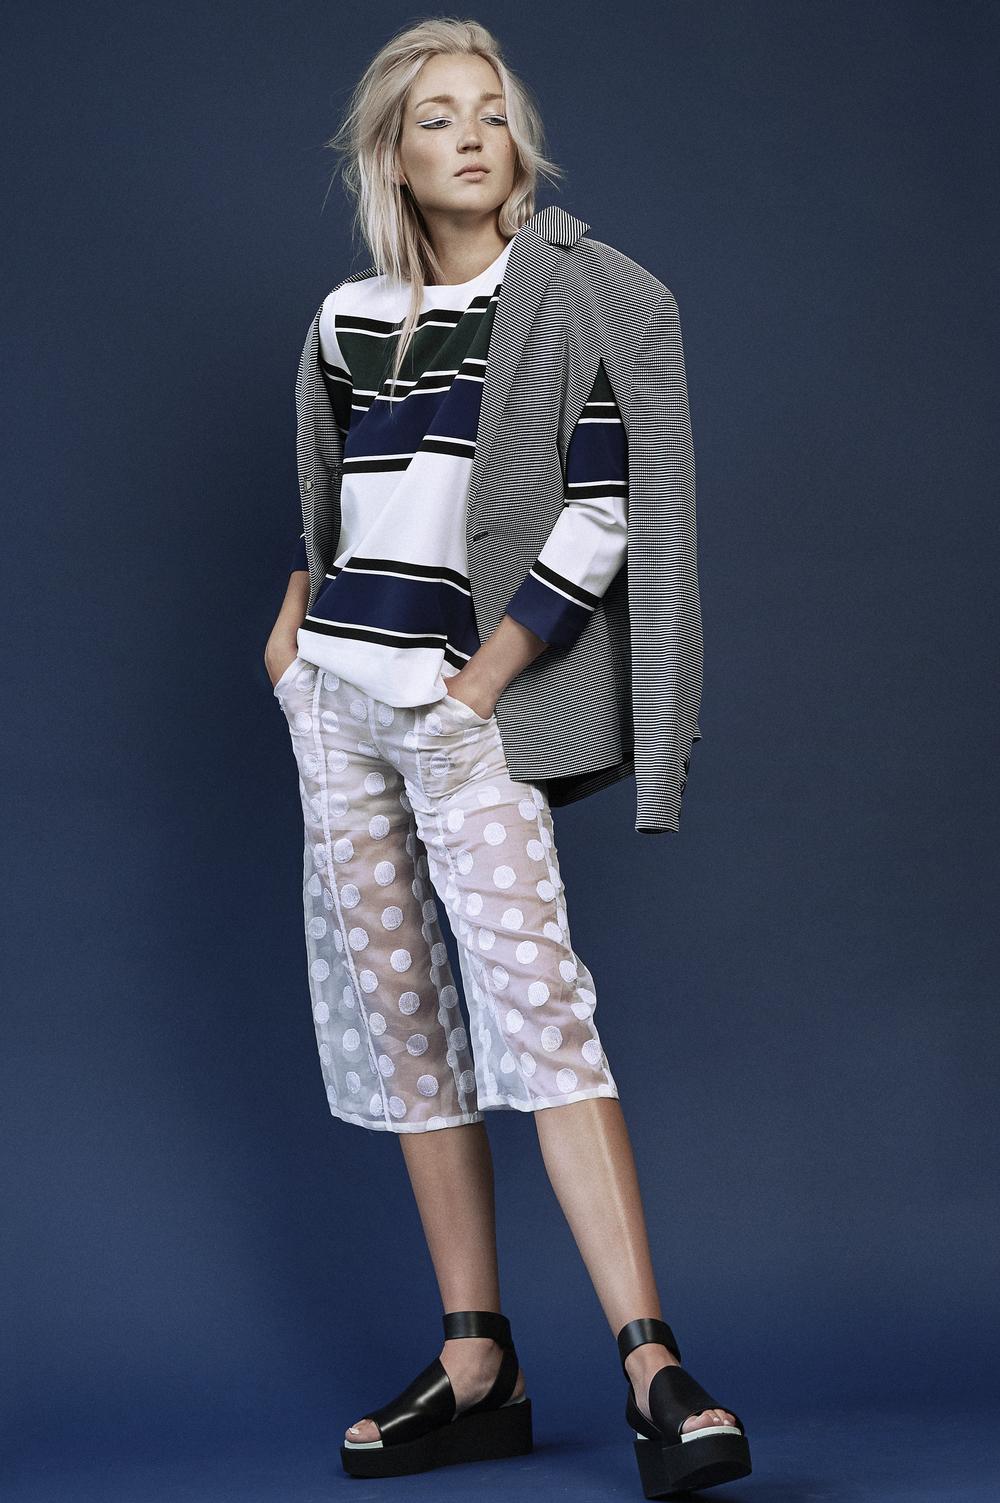 mitelman_fashion_violets_are_blue_05.jpg